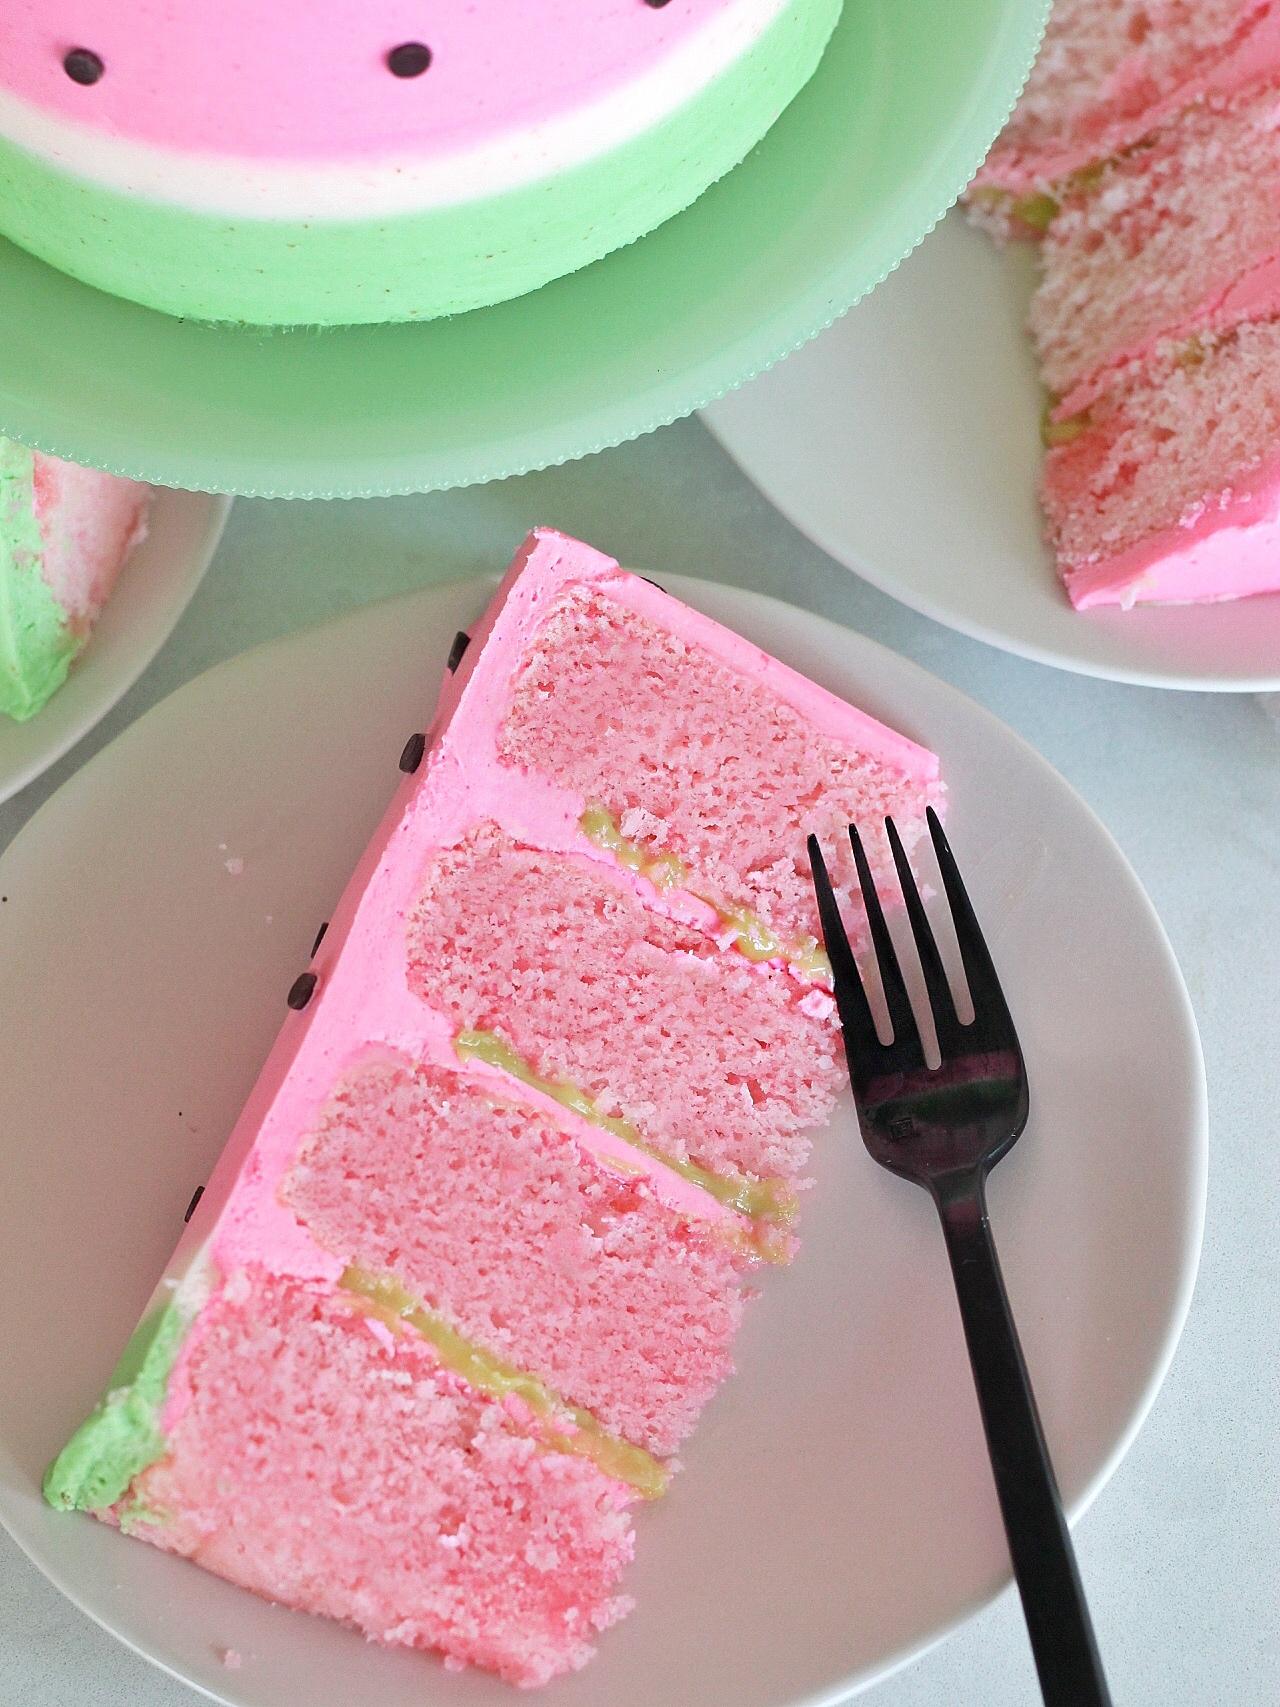 Watermelon Lime Cake: white cake layers with a watermelon simple syrup, lime curd and watermelon buttercream. #cakebycourtney #cake #cakerecipe #summercakes #cakes #watermeloncake #limecurd